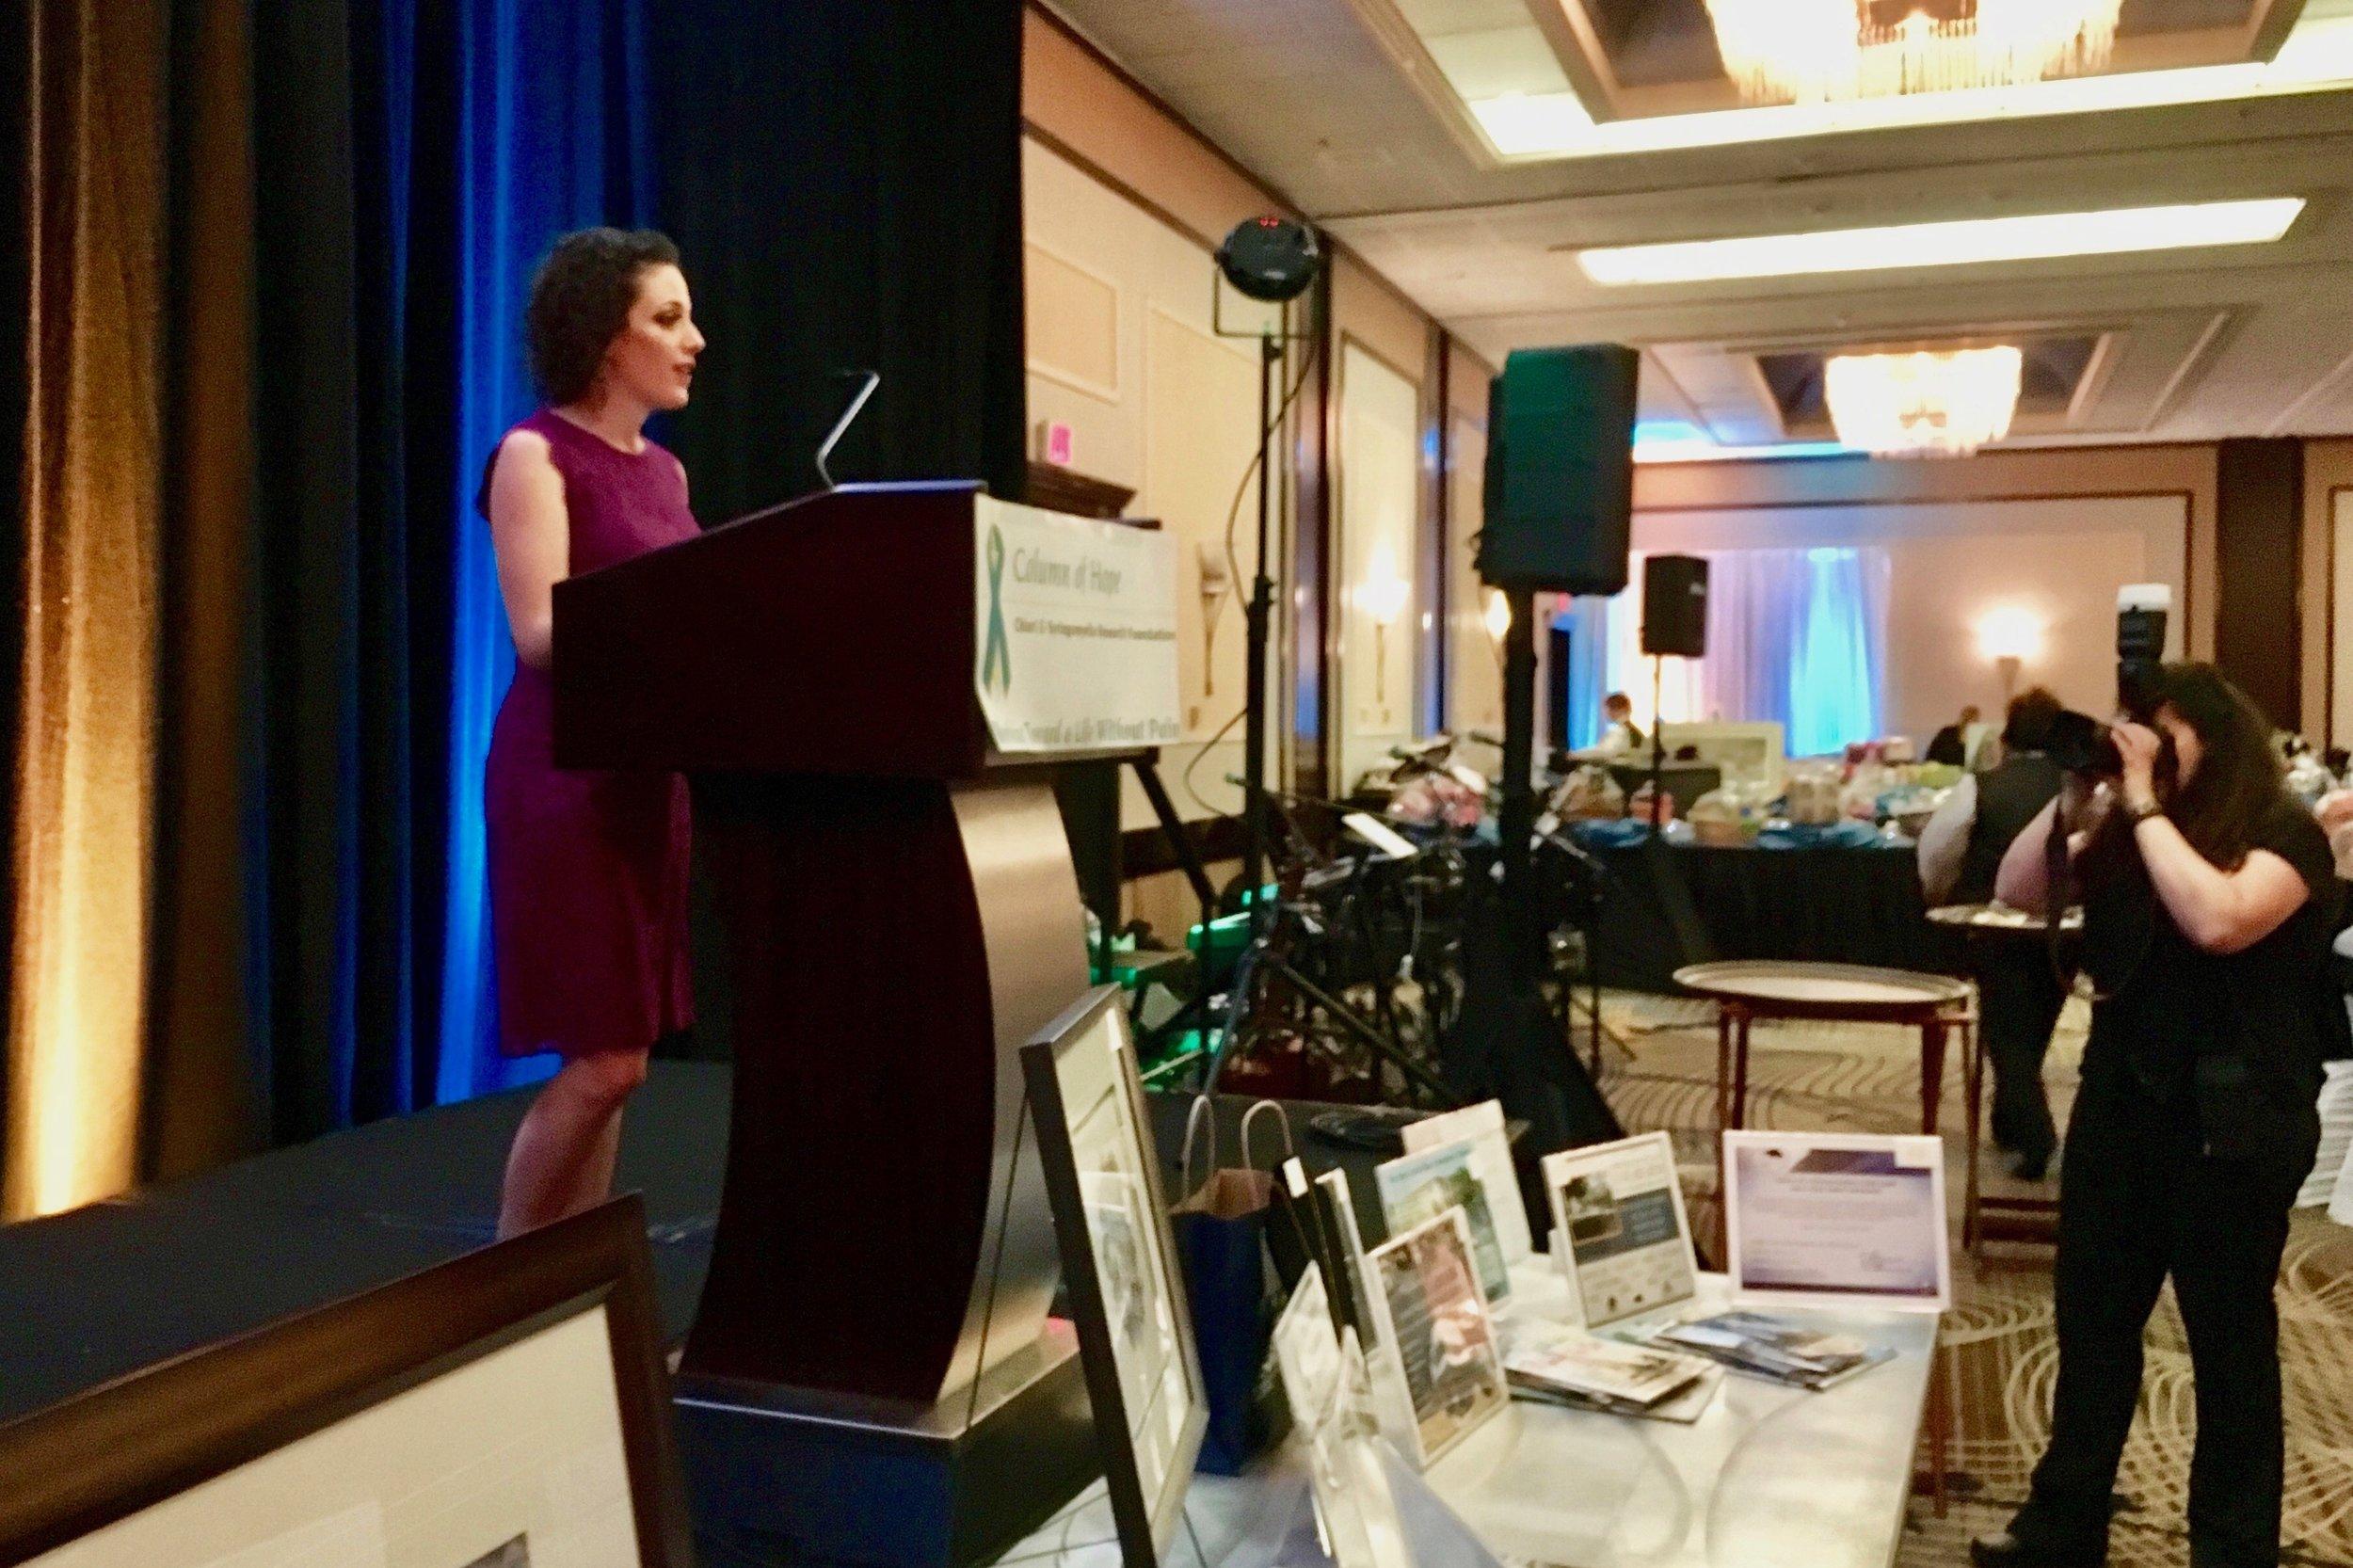 Laura Kane-Punyon introducing her father Mark Kane at the Column of Hope Chairi Gala